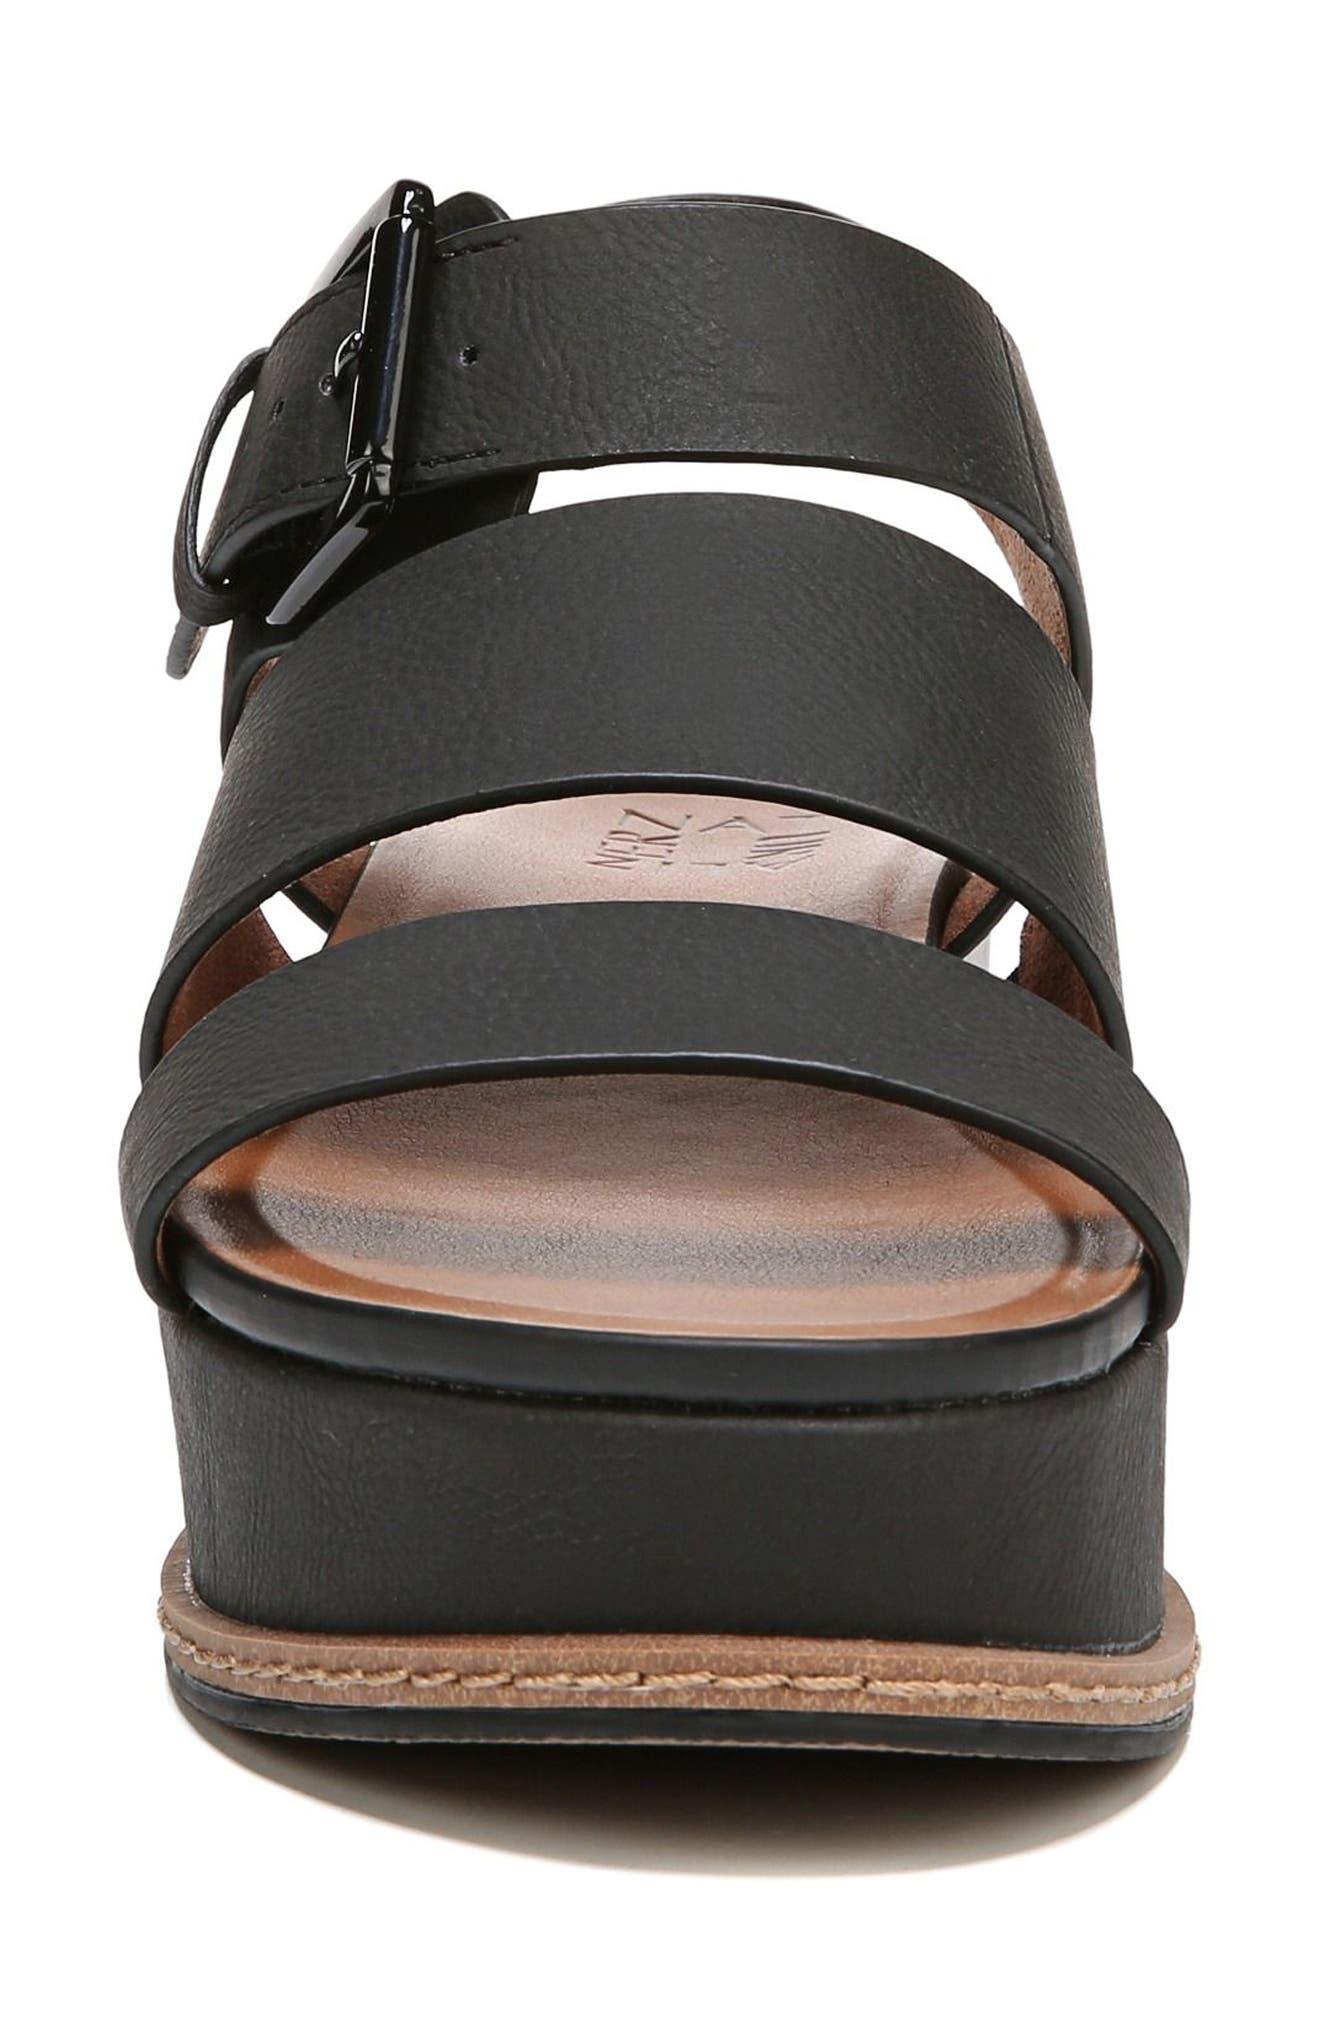 NATURALIZER, Billie Platform Sandal, Alternate thumbnail 4, color, BLACK FAUX NUBUCK LEATHER